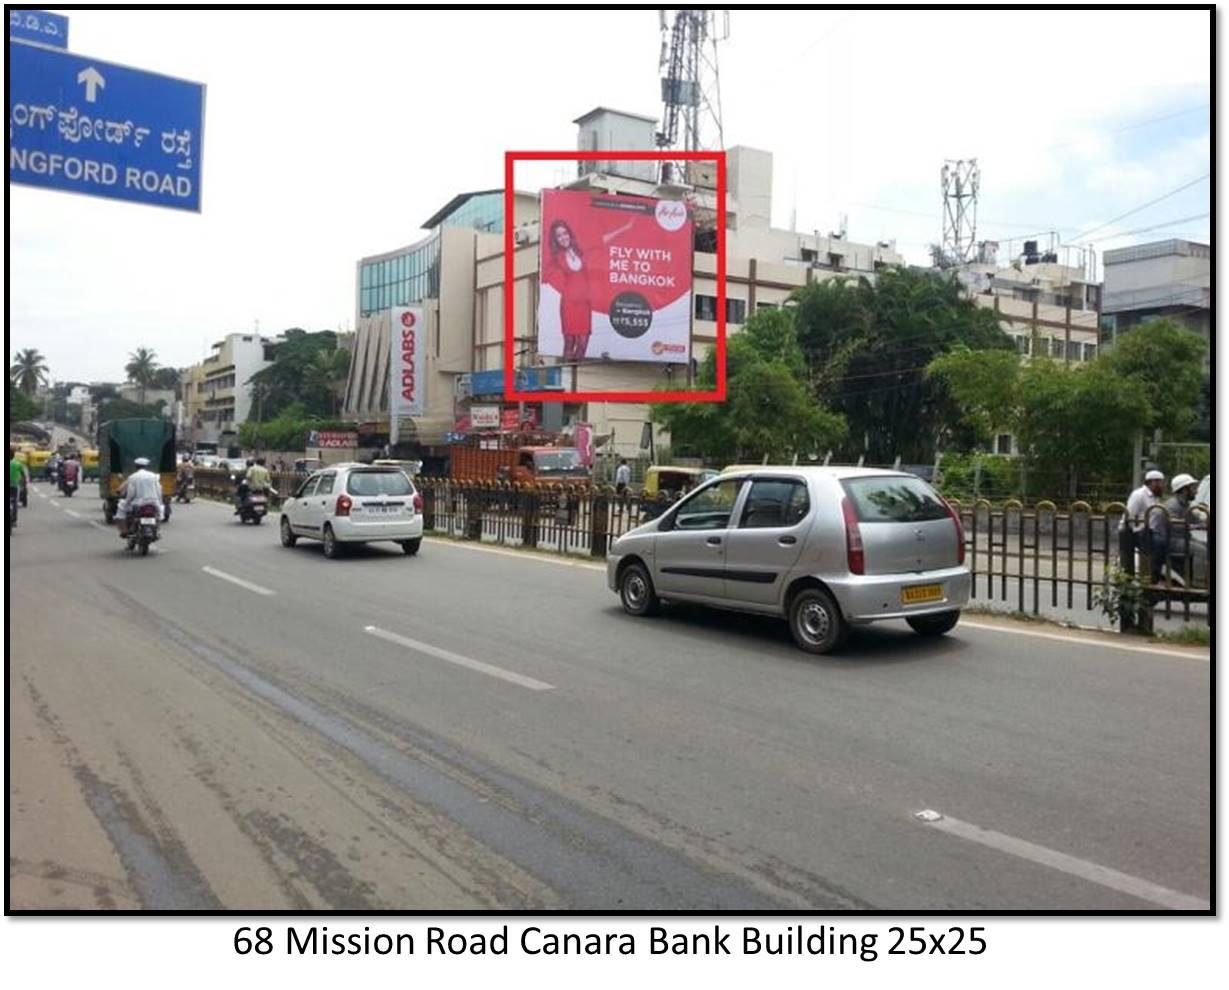 Mission Road Canara Bank Building, Bengaluru